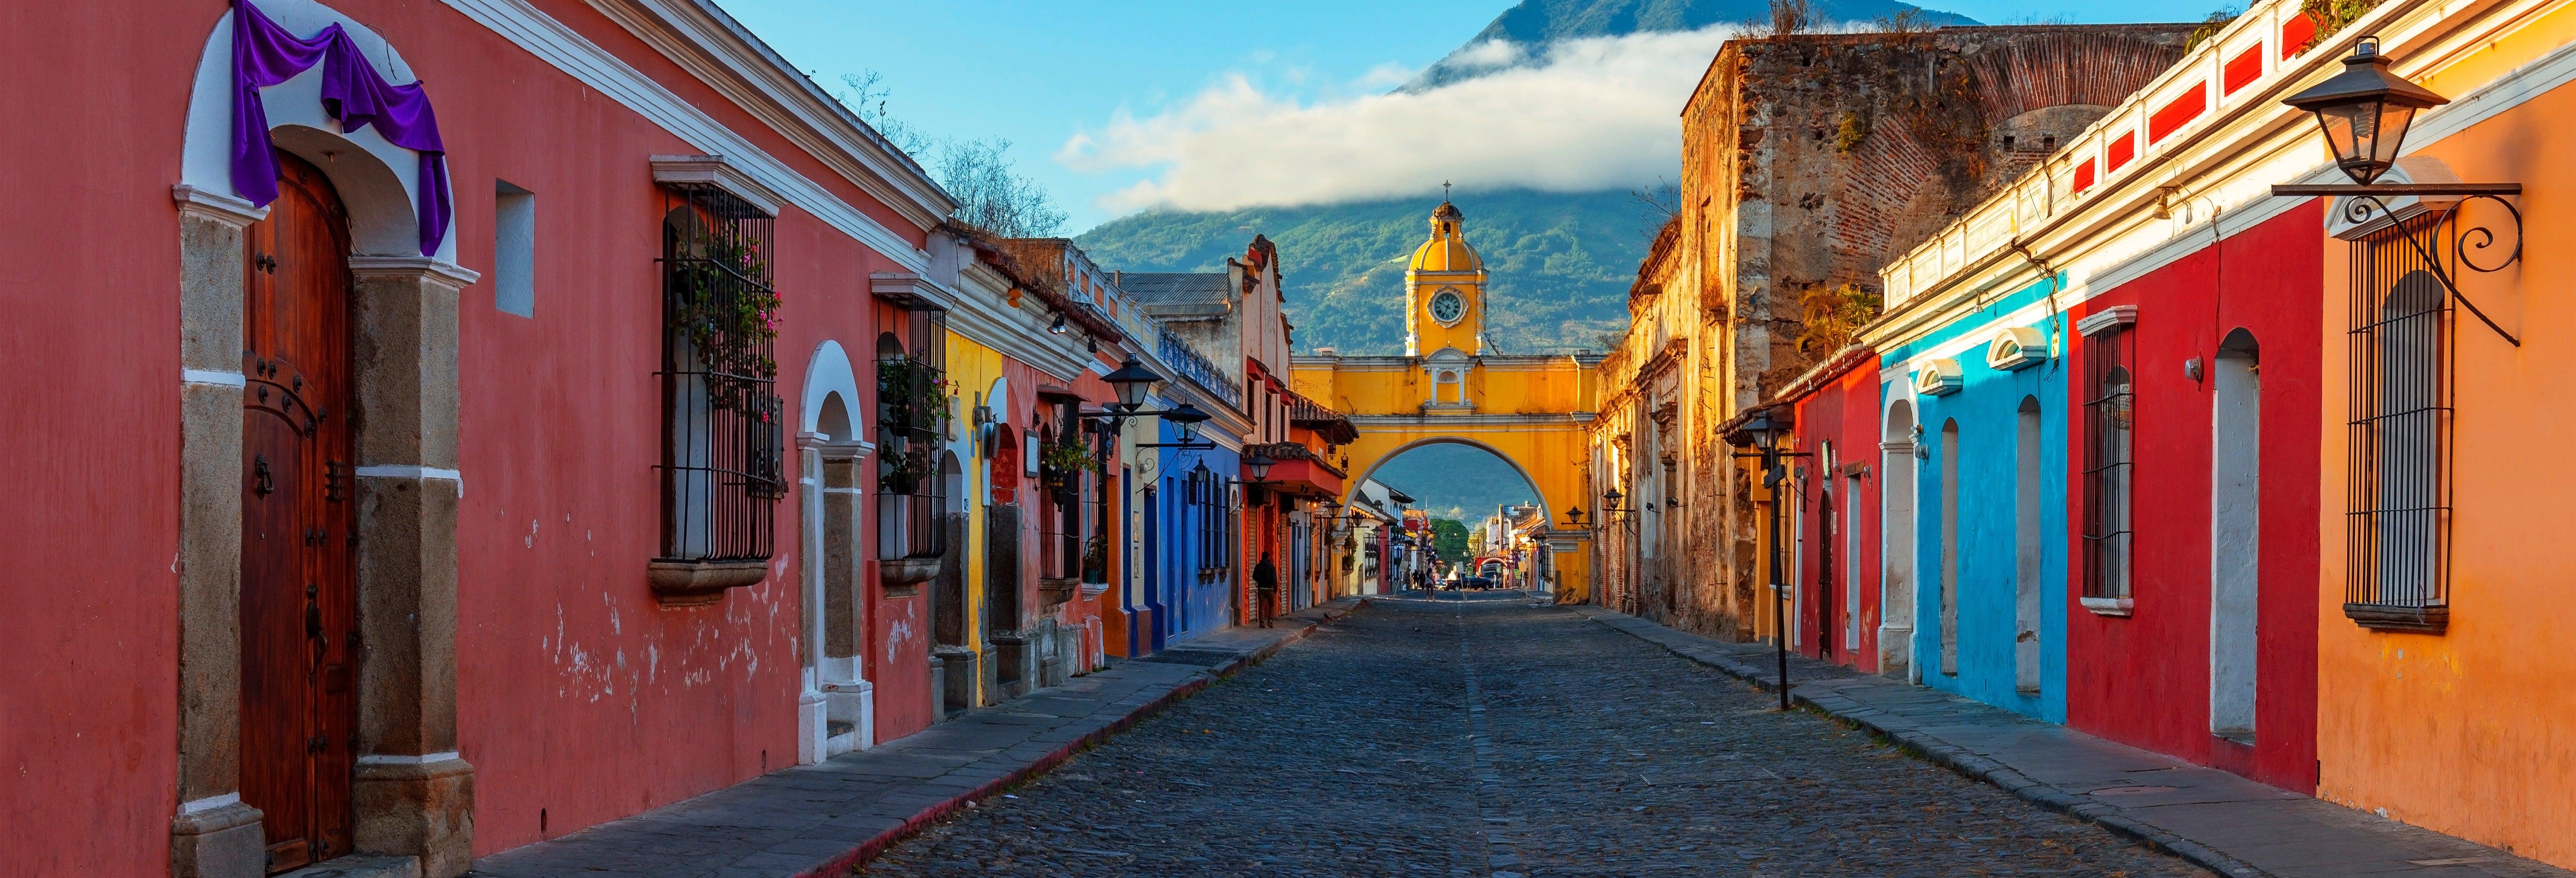 Excursão a Antigua Guatemala